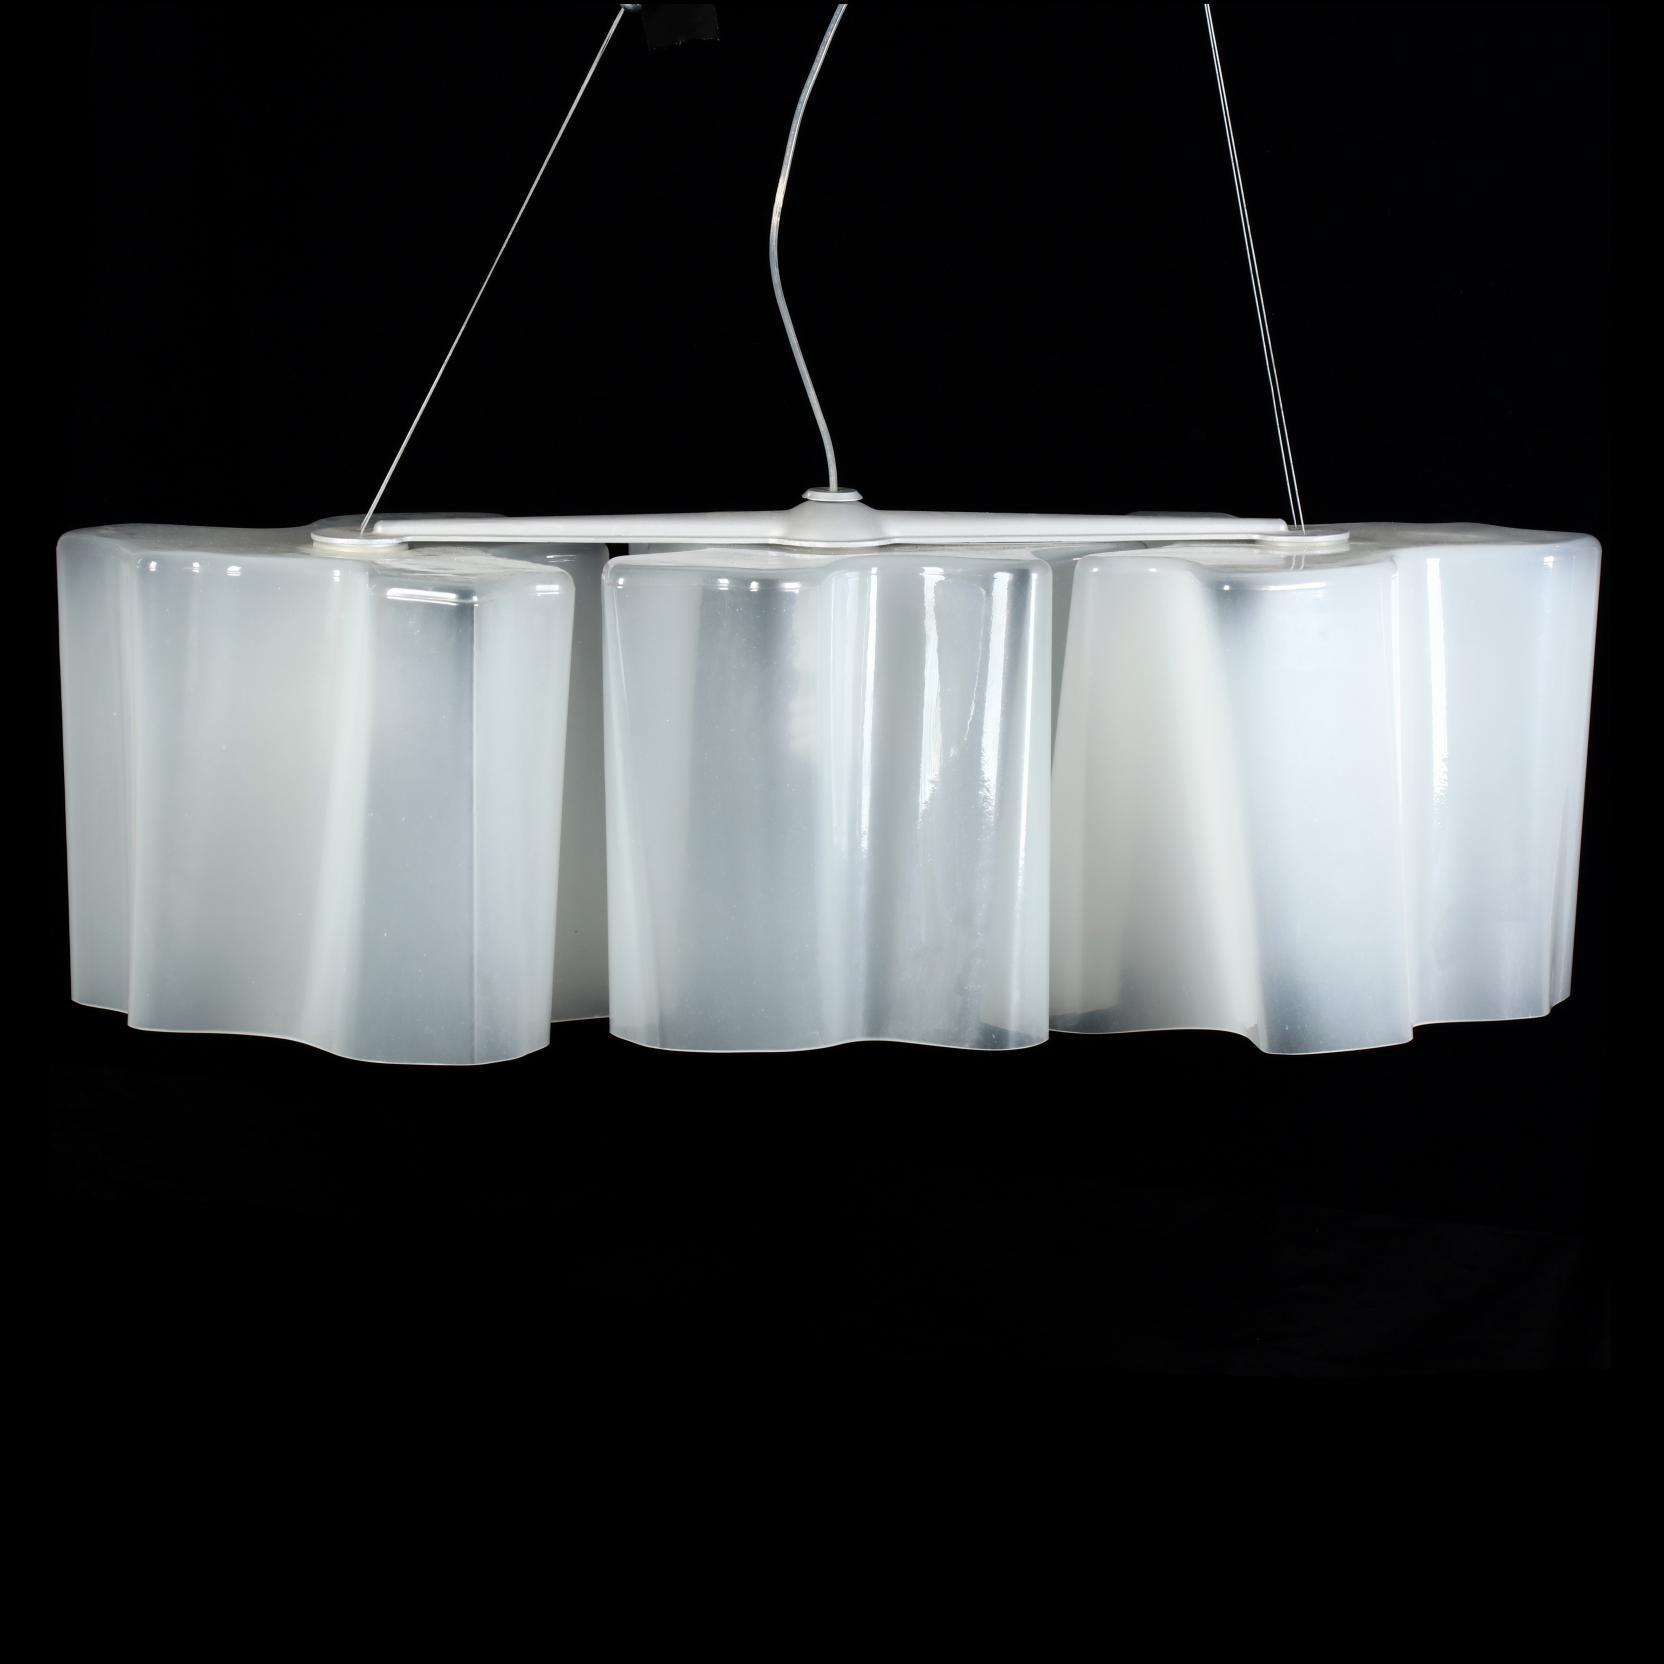 artemide-i-logico-i-suspension-pendant-light